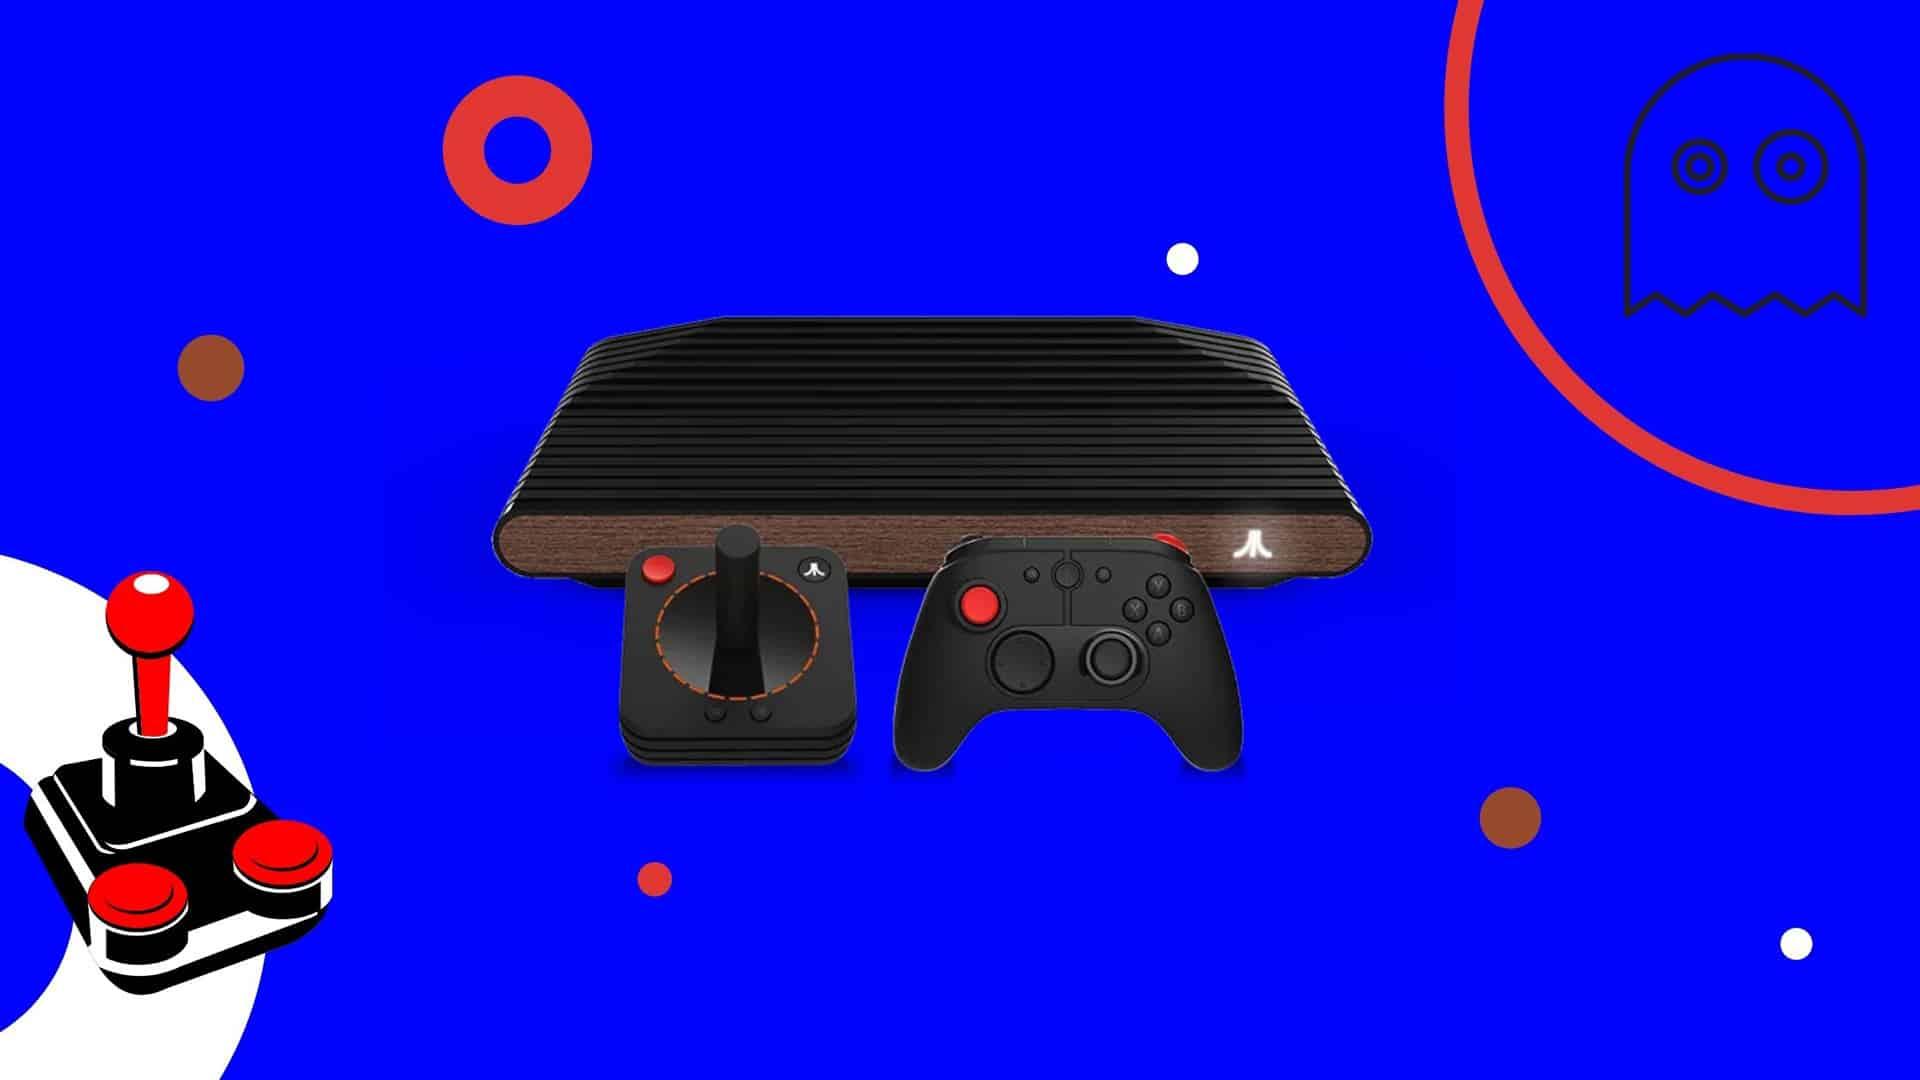 Atari VCS launching